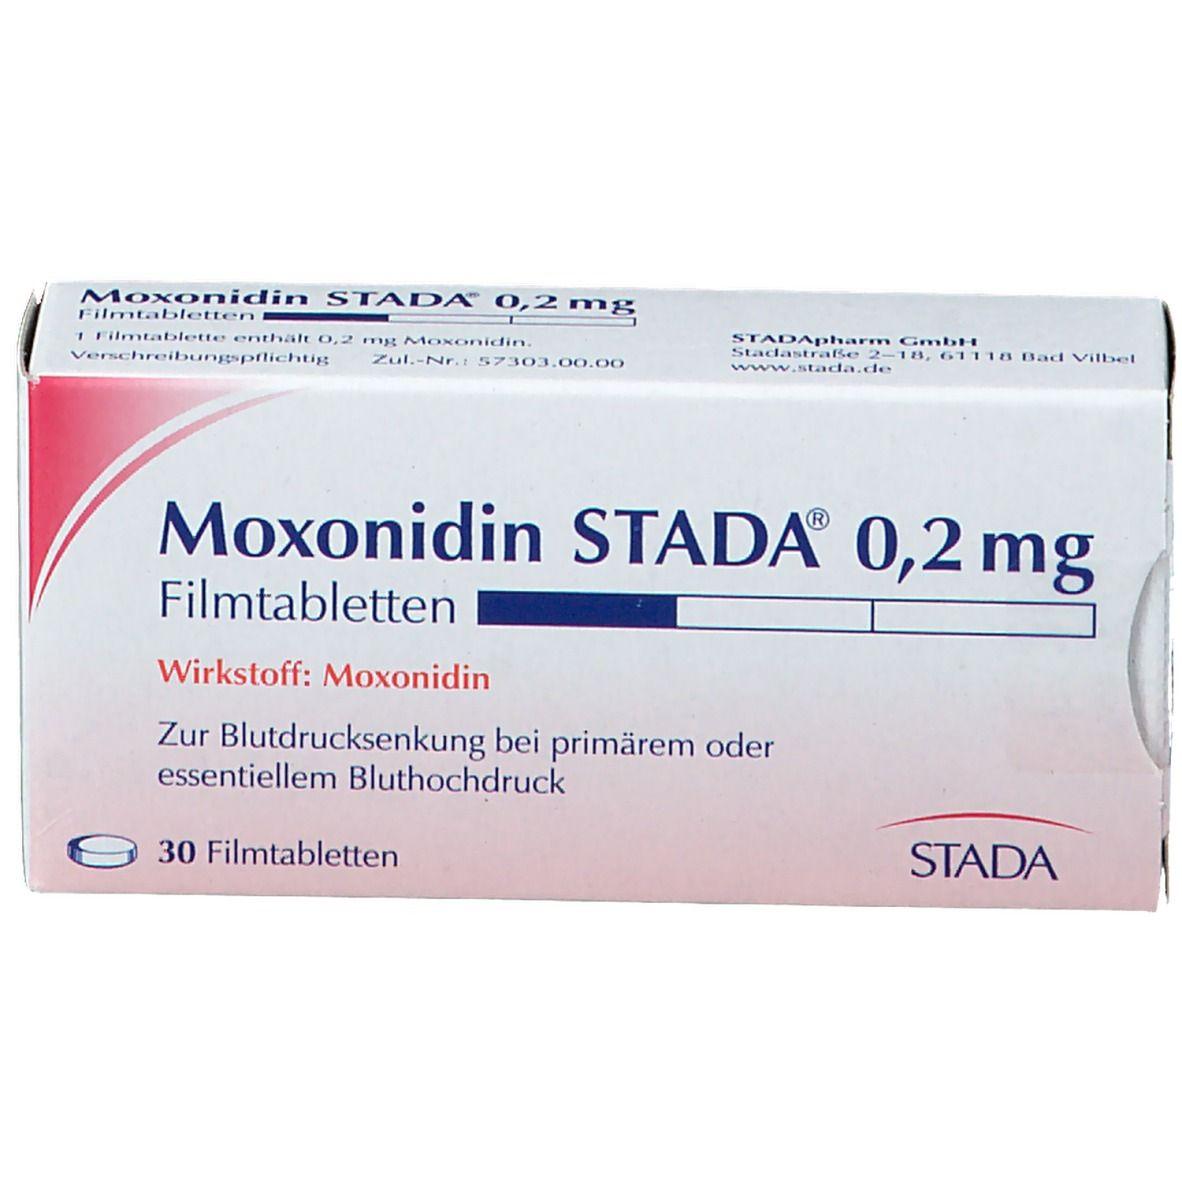 Moxonidin STADA® 0,2 mg Filmtabletten